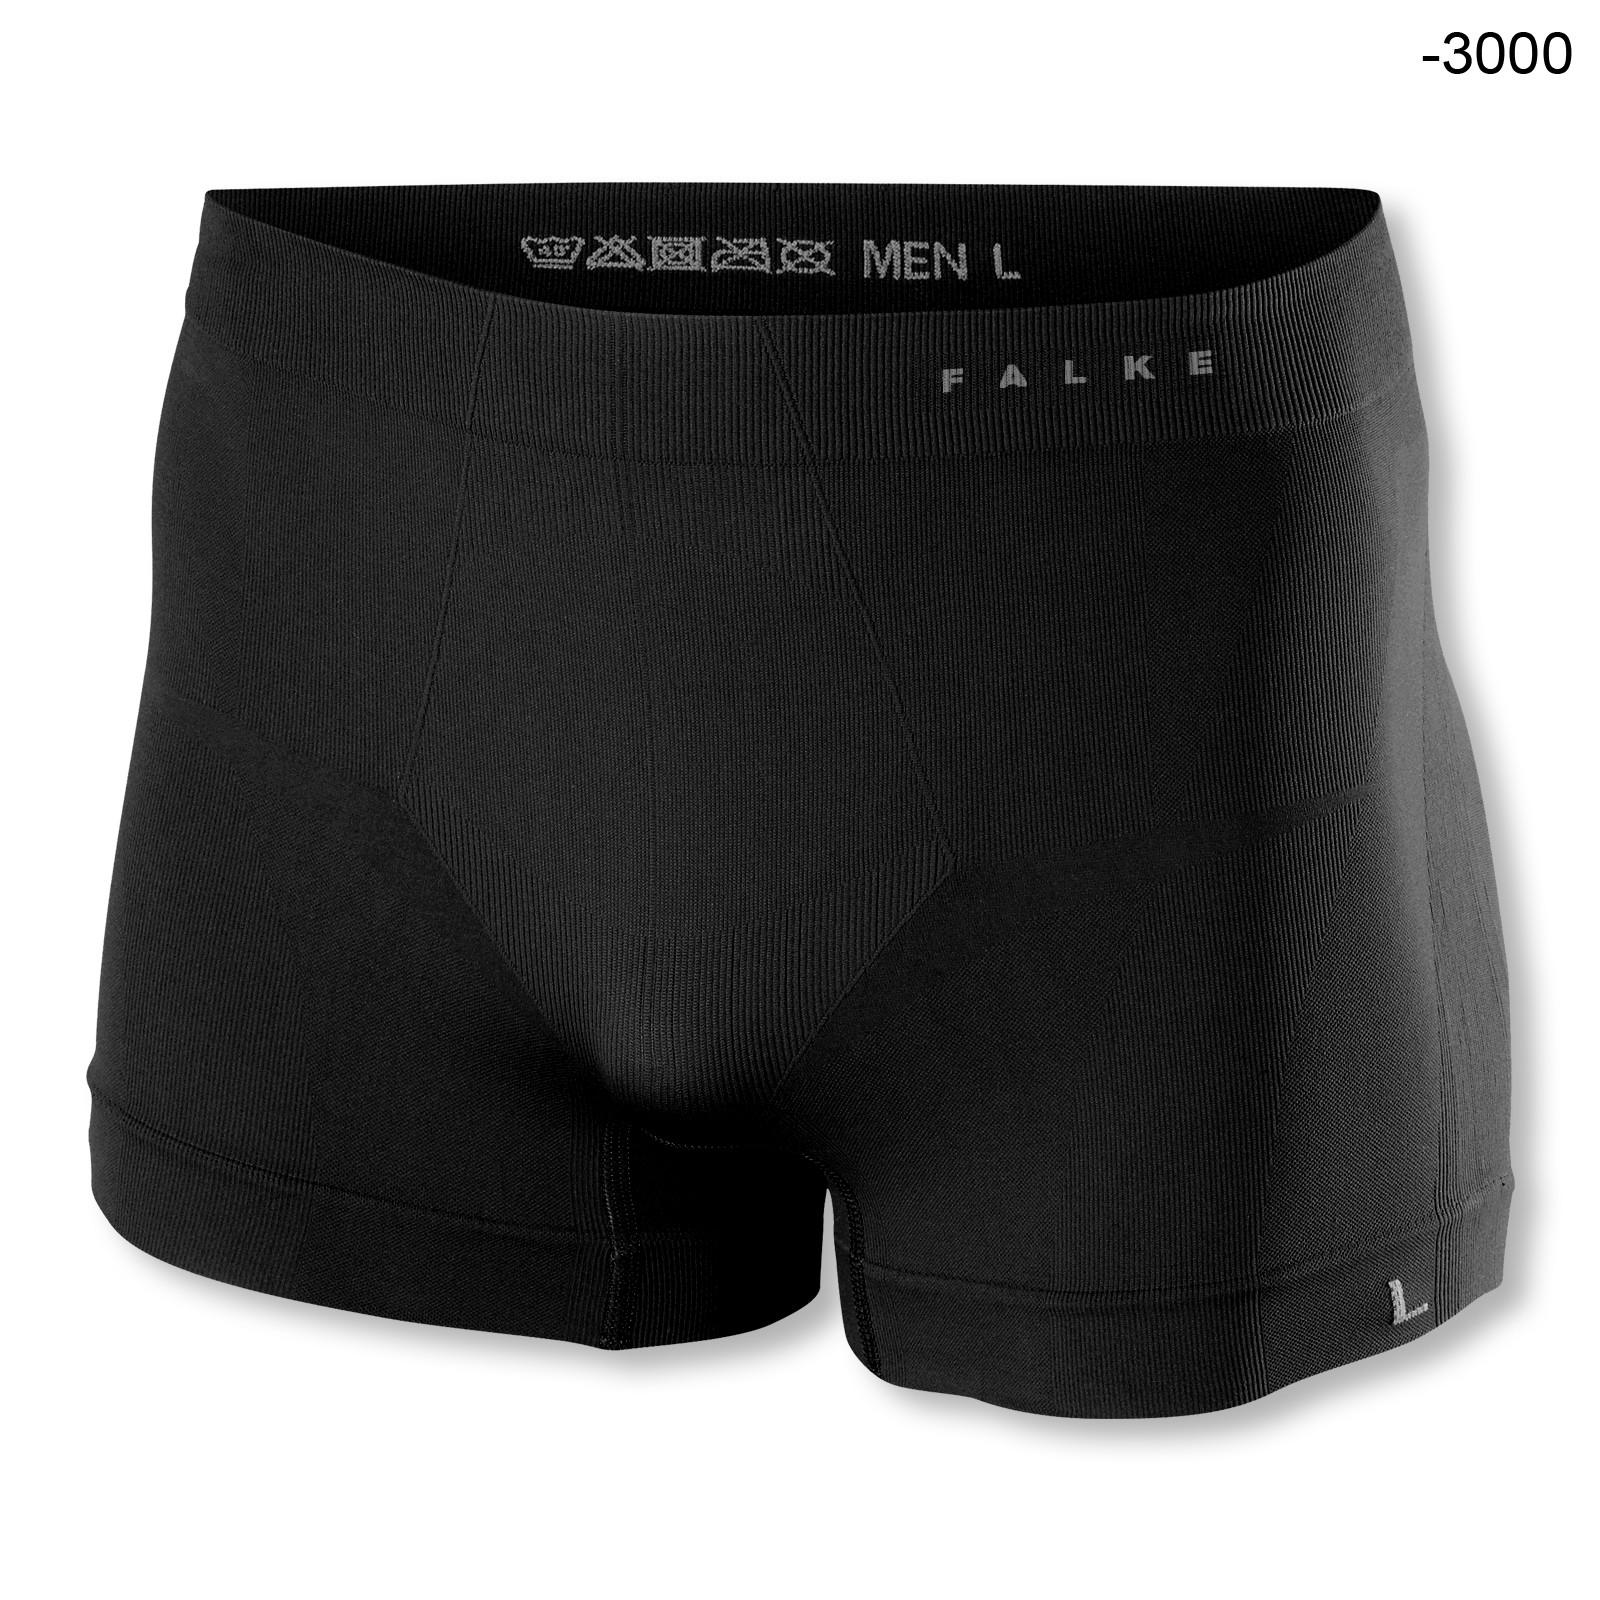 Falke Herren Boxershorts Funktionsunterwäsche Warm Tight Fit M L XL 2XL 39618 in black